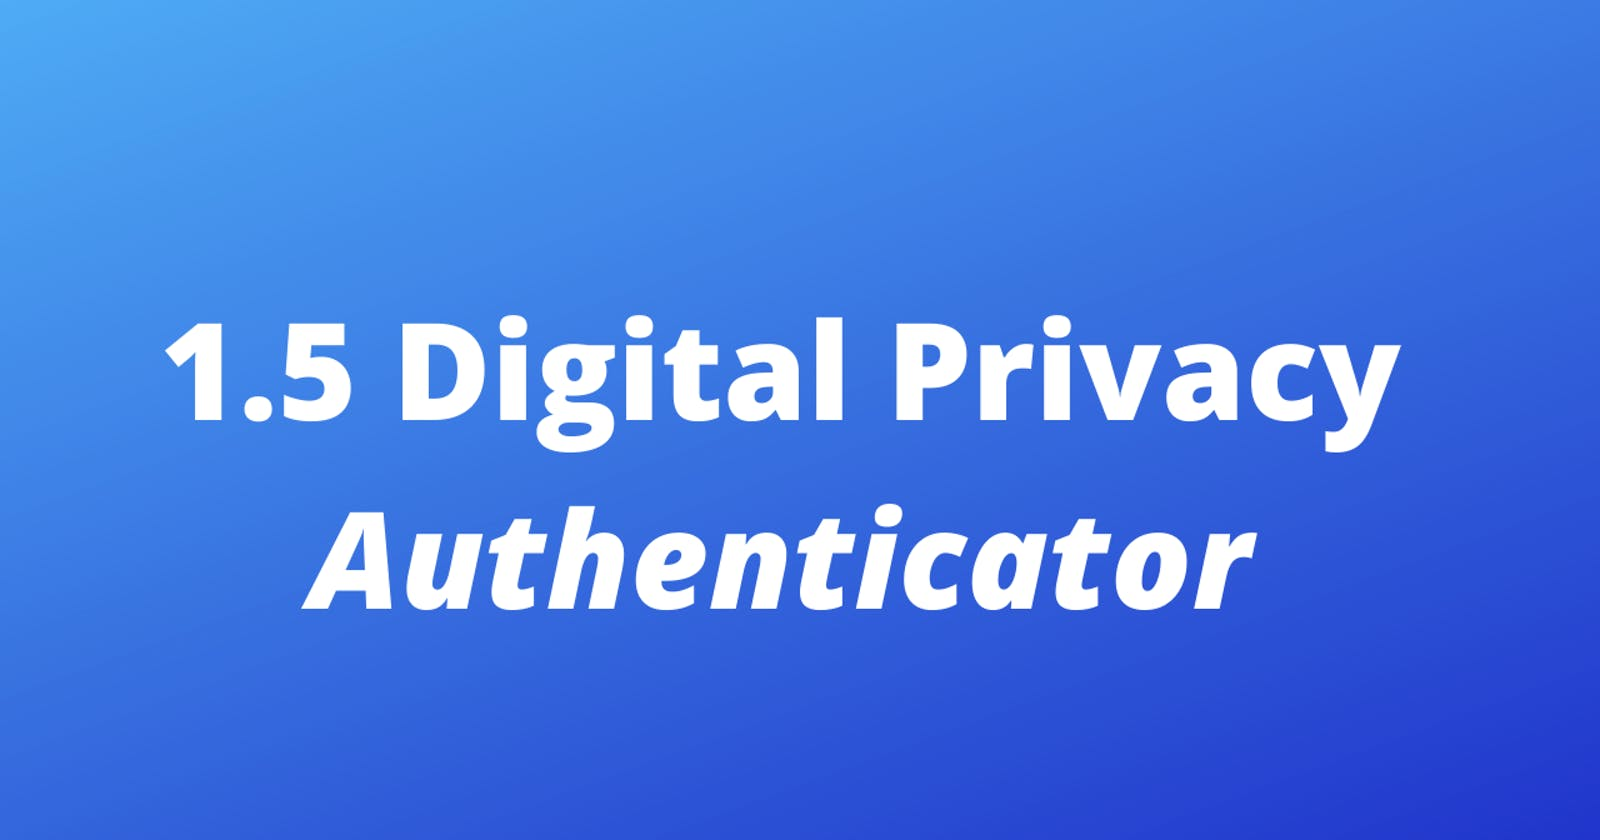 1.5 Digital Privacy: Authenticator